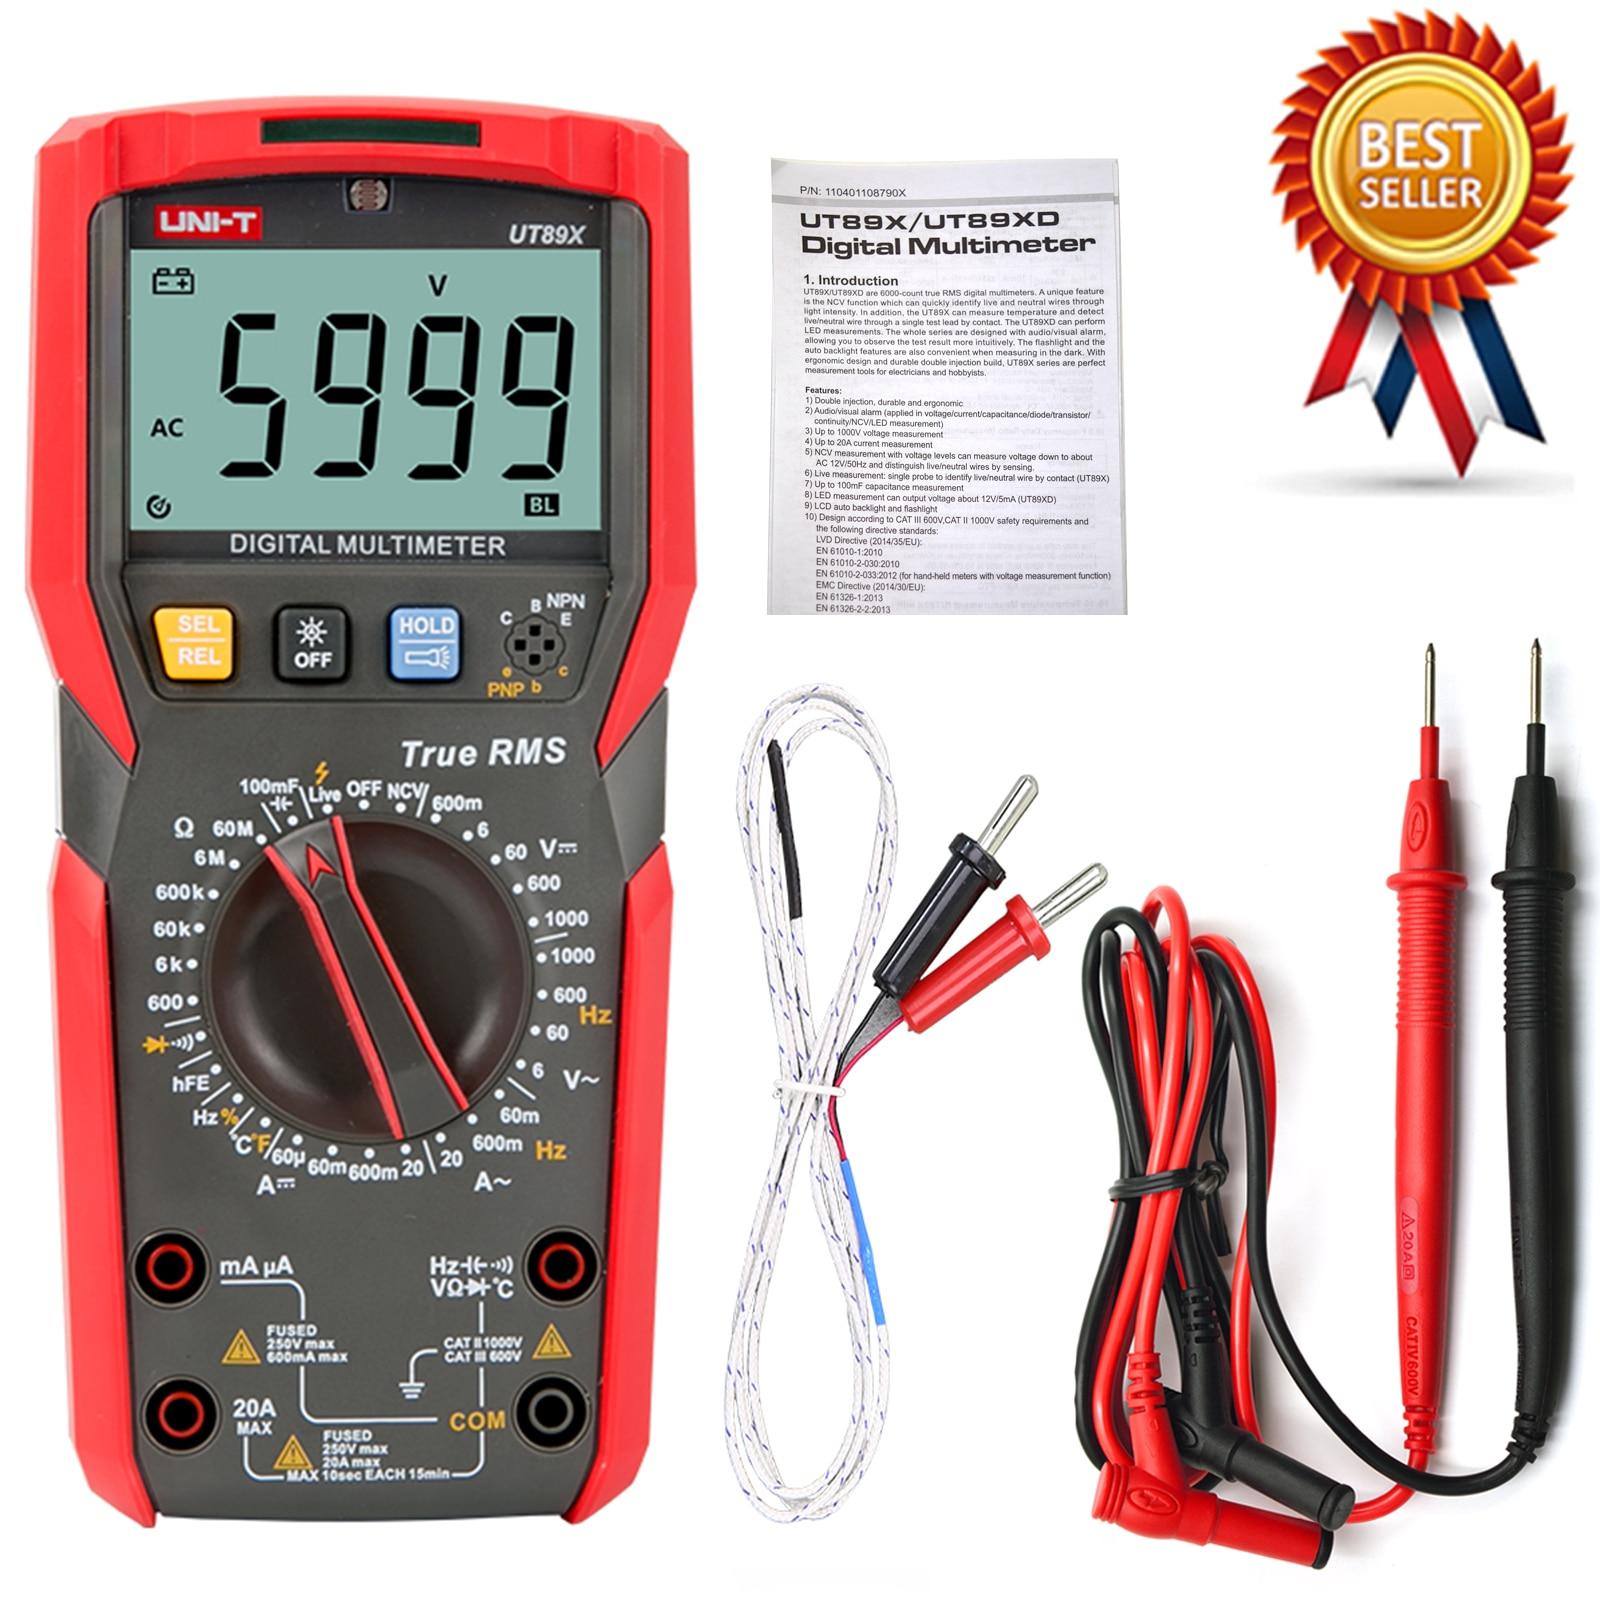 UNI-T ut89x/ut89xd verdadeiro rms multímetro digital verdadeiro rms testador ac/dc voltímetro amperímetro 1000v 20a frequência led medida.